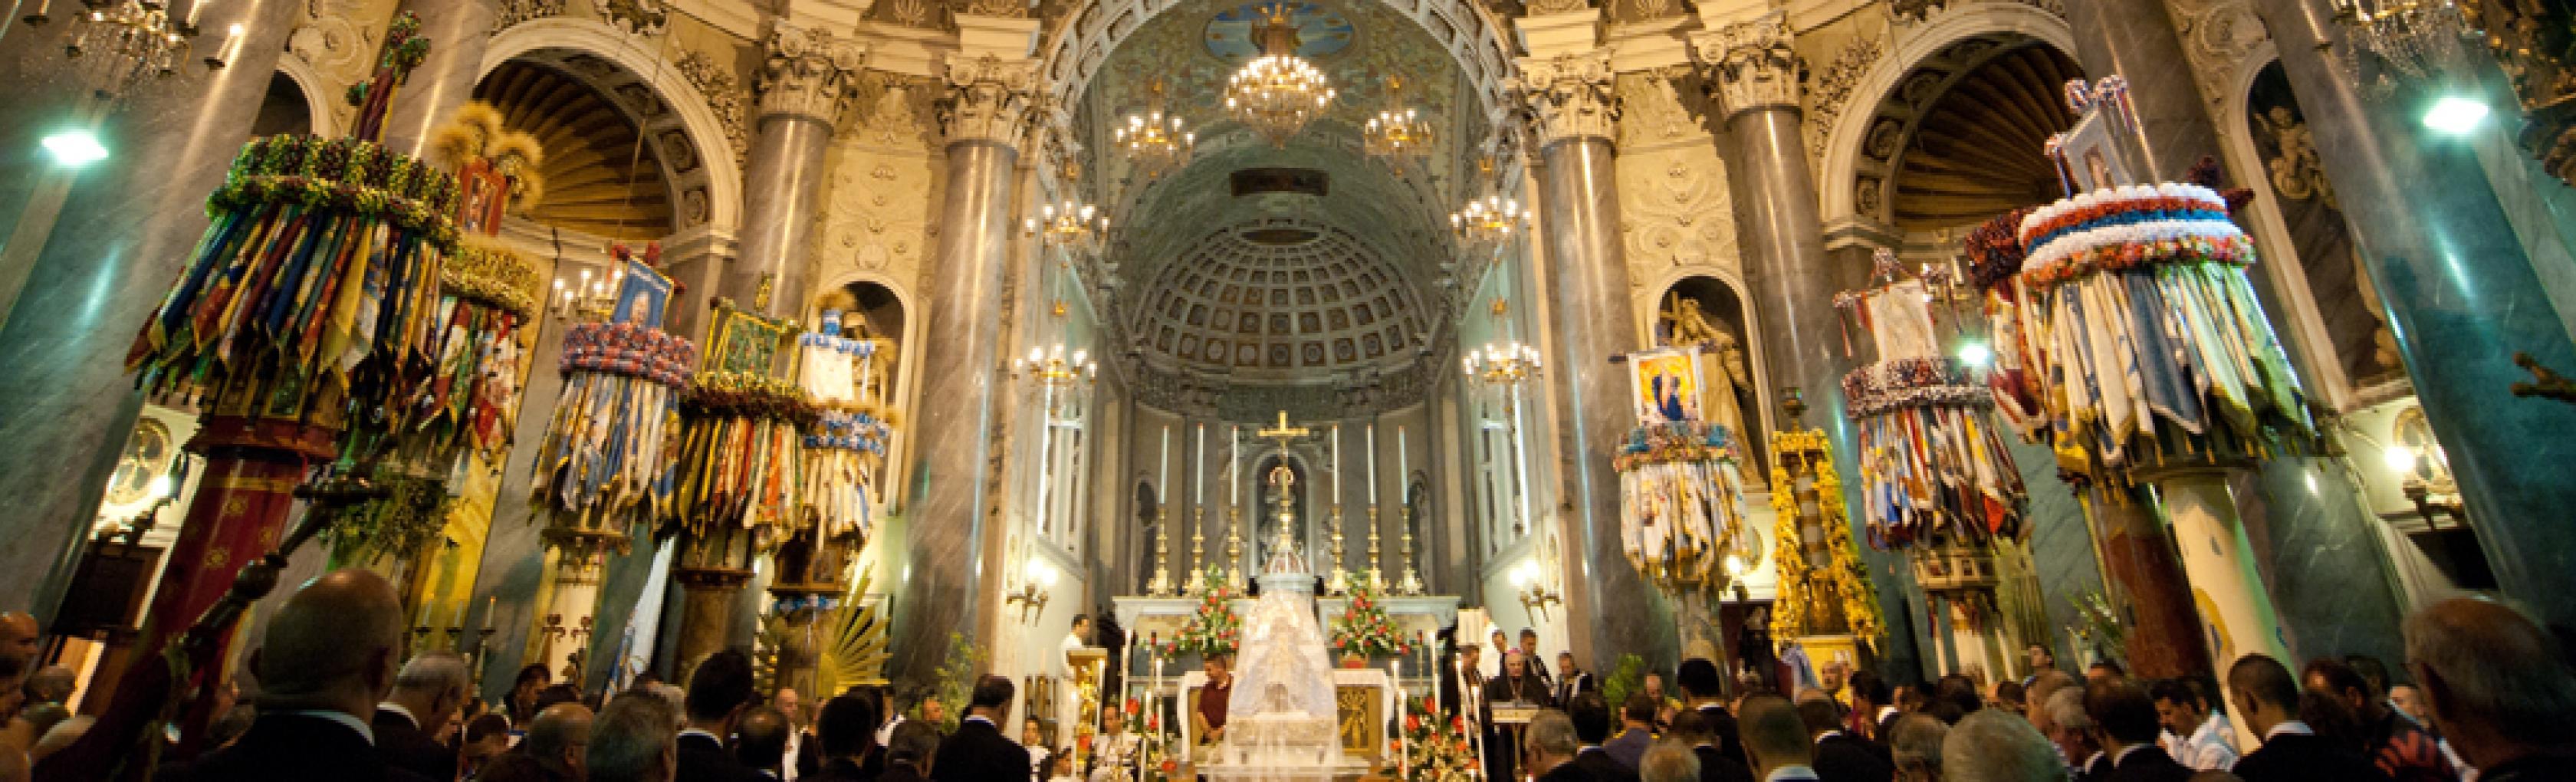 Candelieri - Chiesa di santa Maria